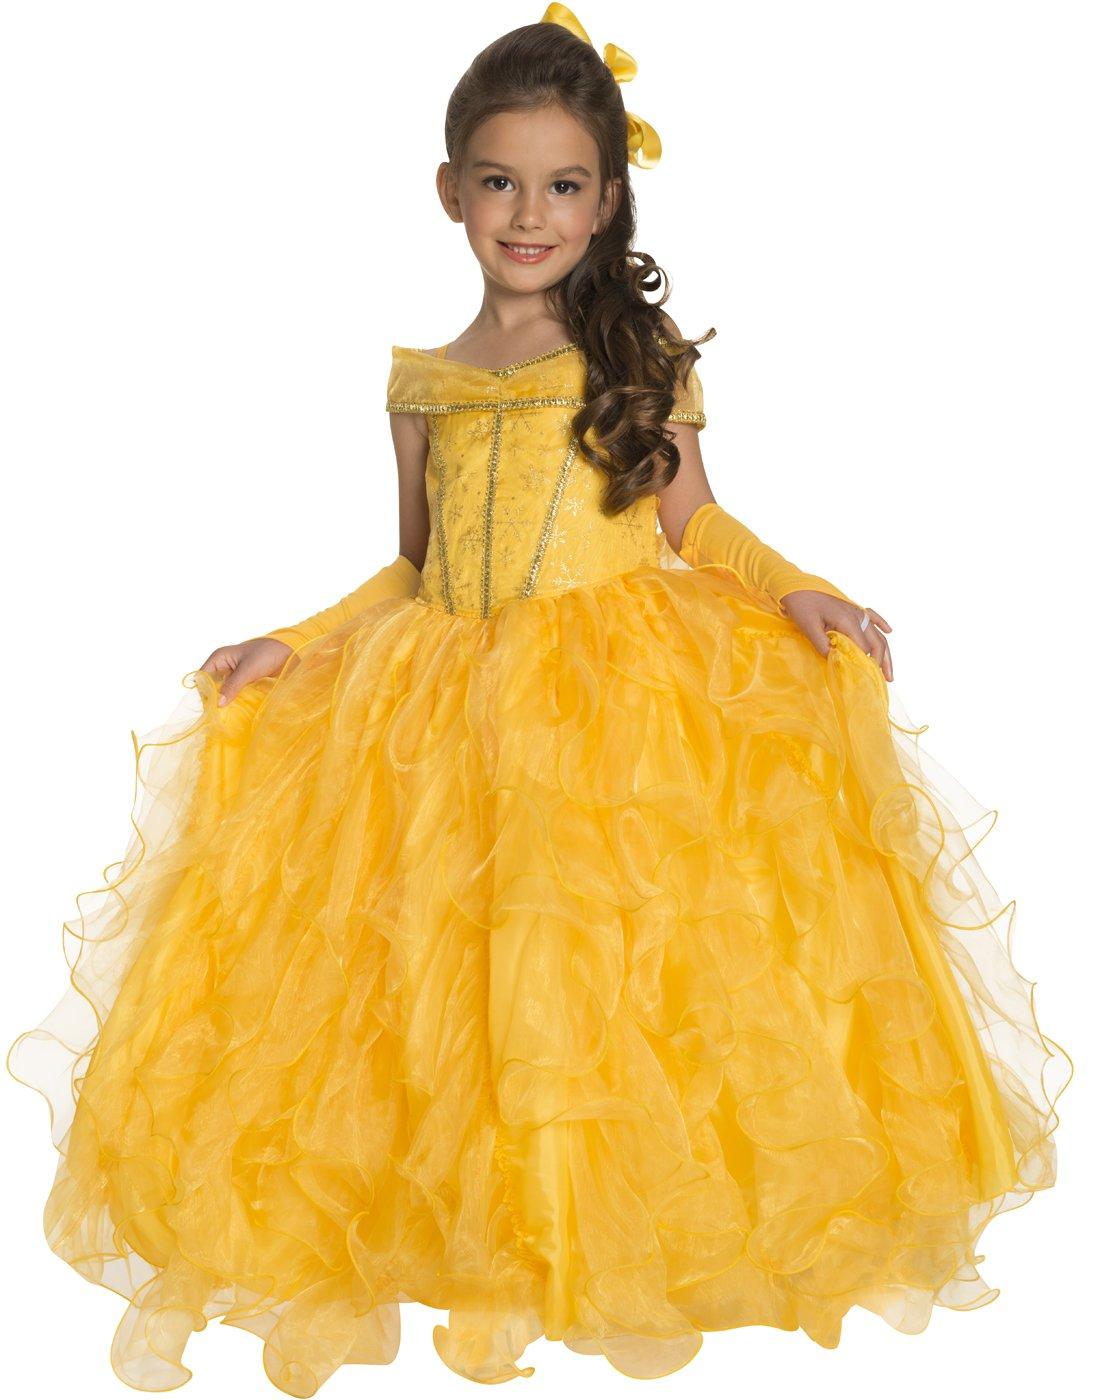 Rubie's Deluxe Princess Jessica Costume, Yellow, Small